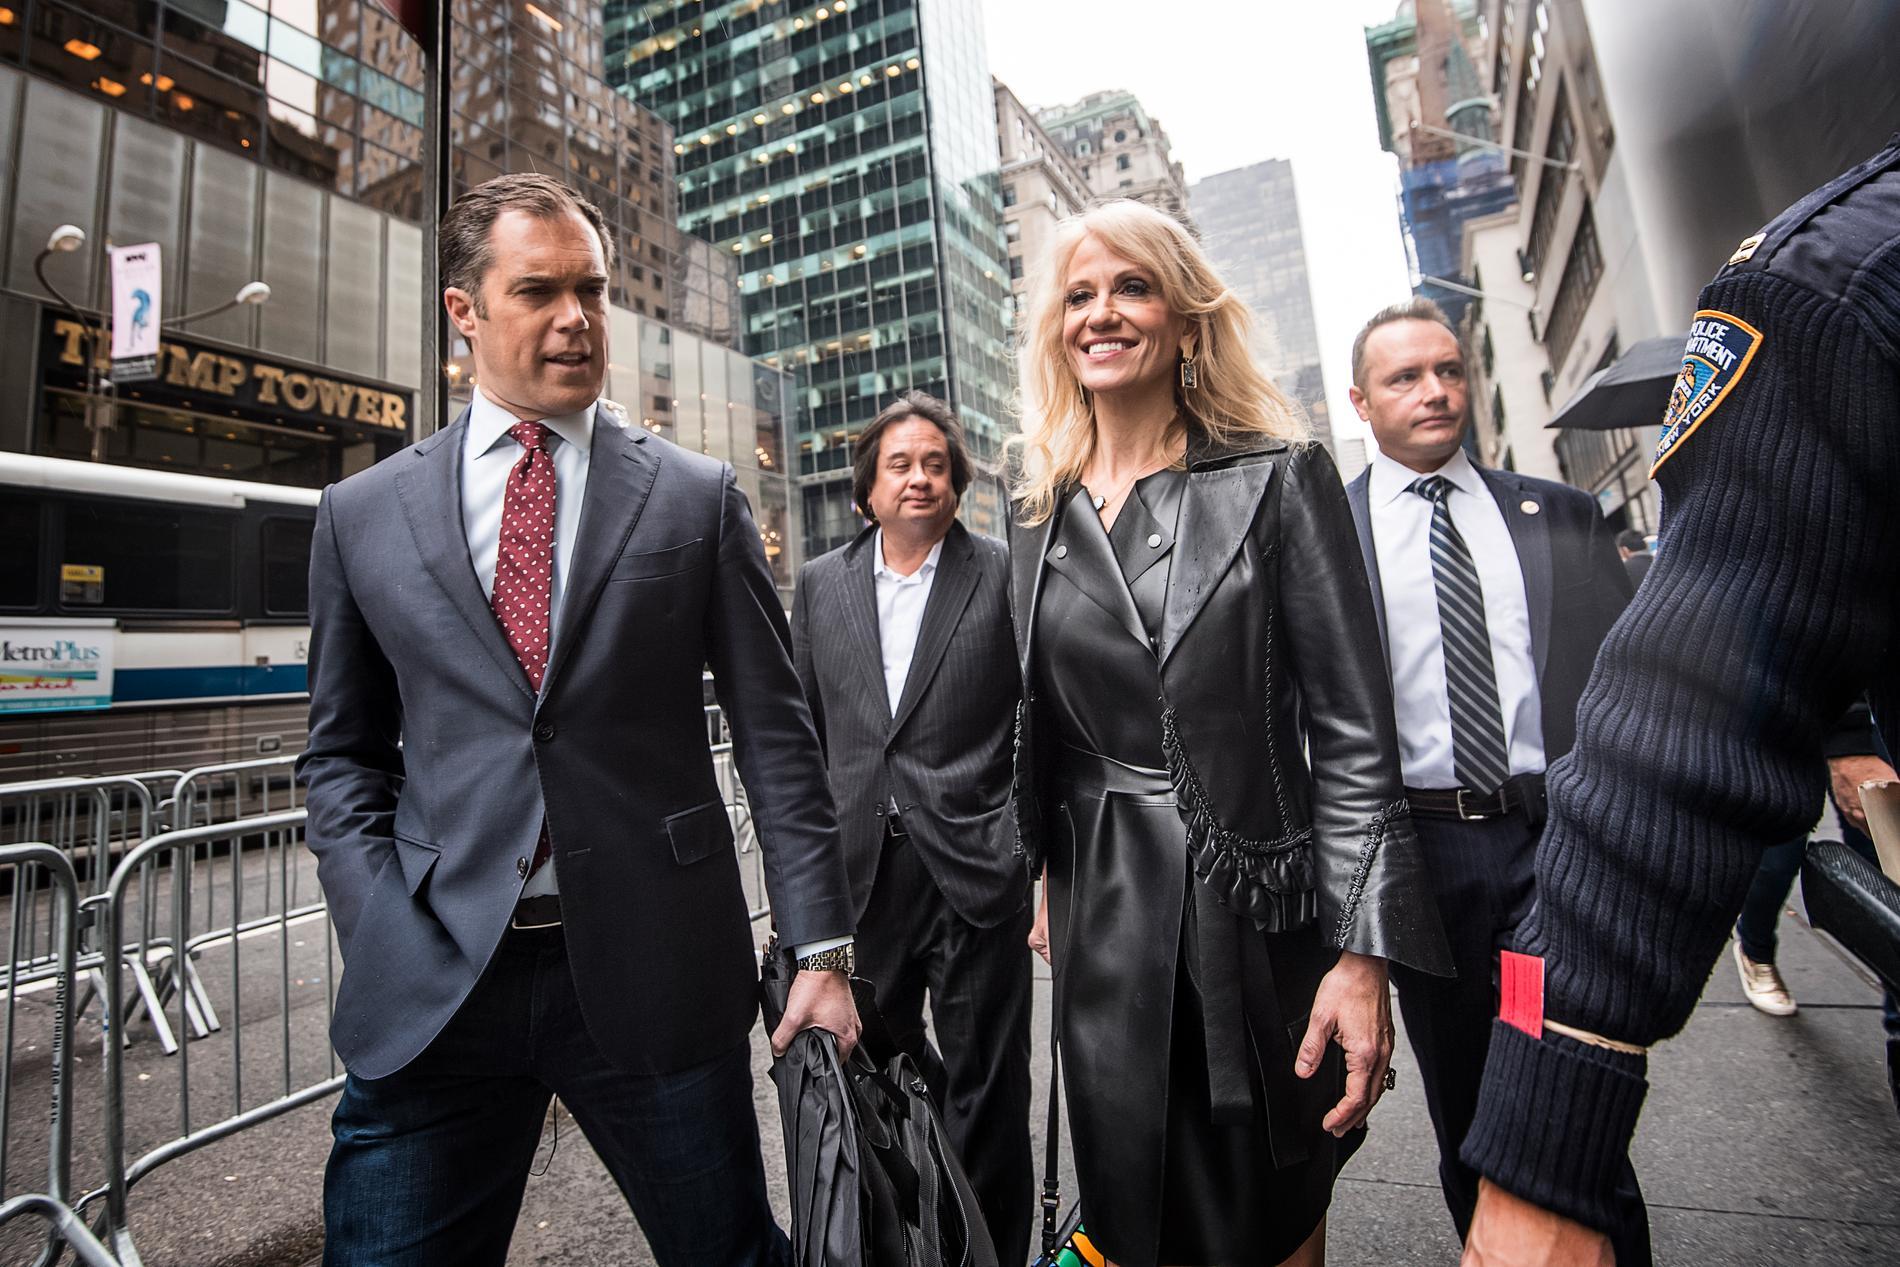 Kellyanne Conway utanför Trump Tower i New York under presidentvalskampanjen